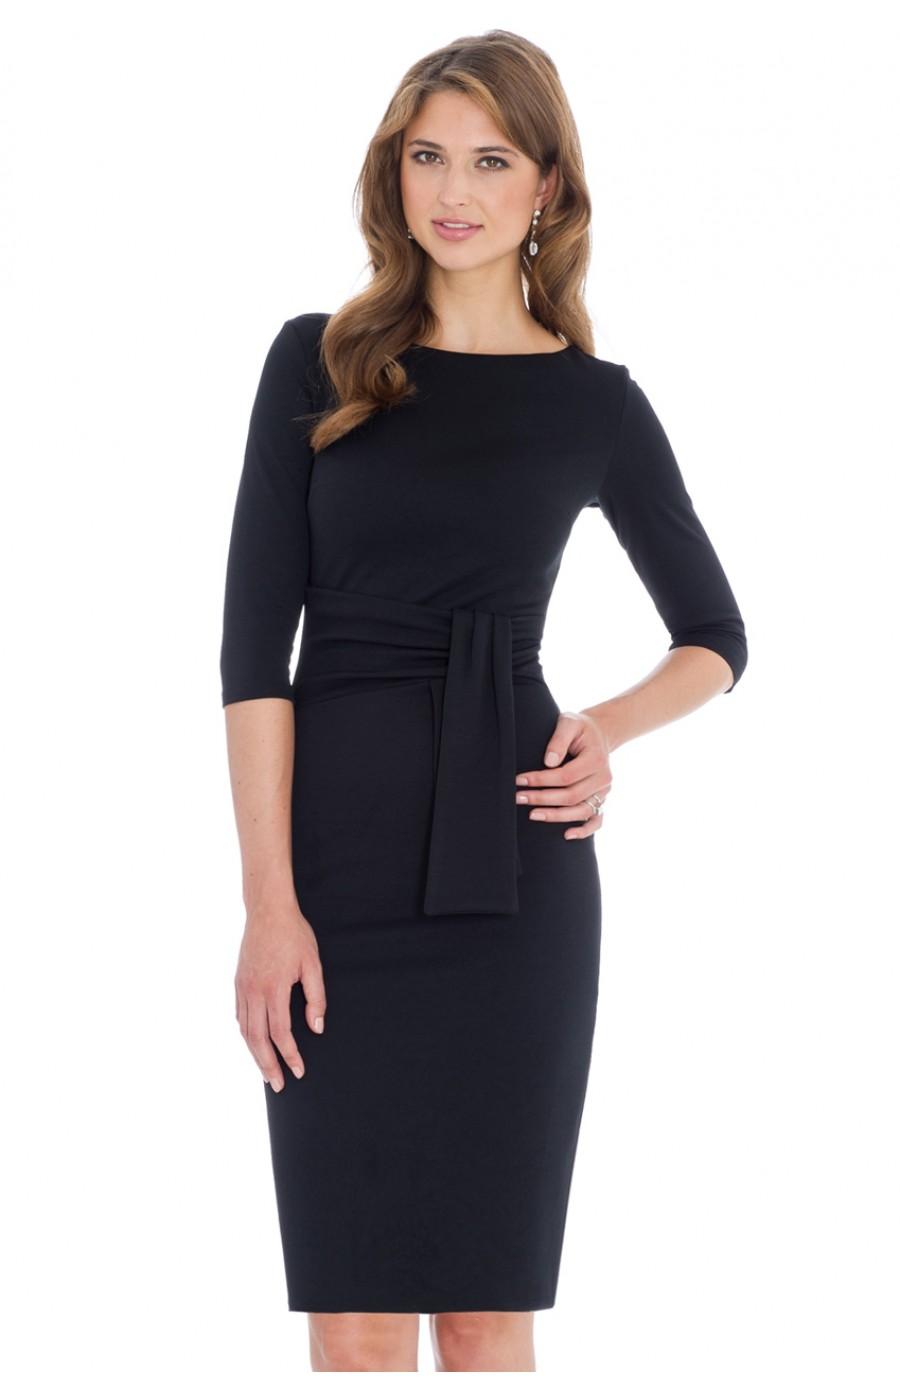 ba3803b2780b Μίντι φόρεμα γραφείου μαύρο